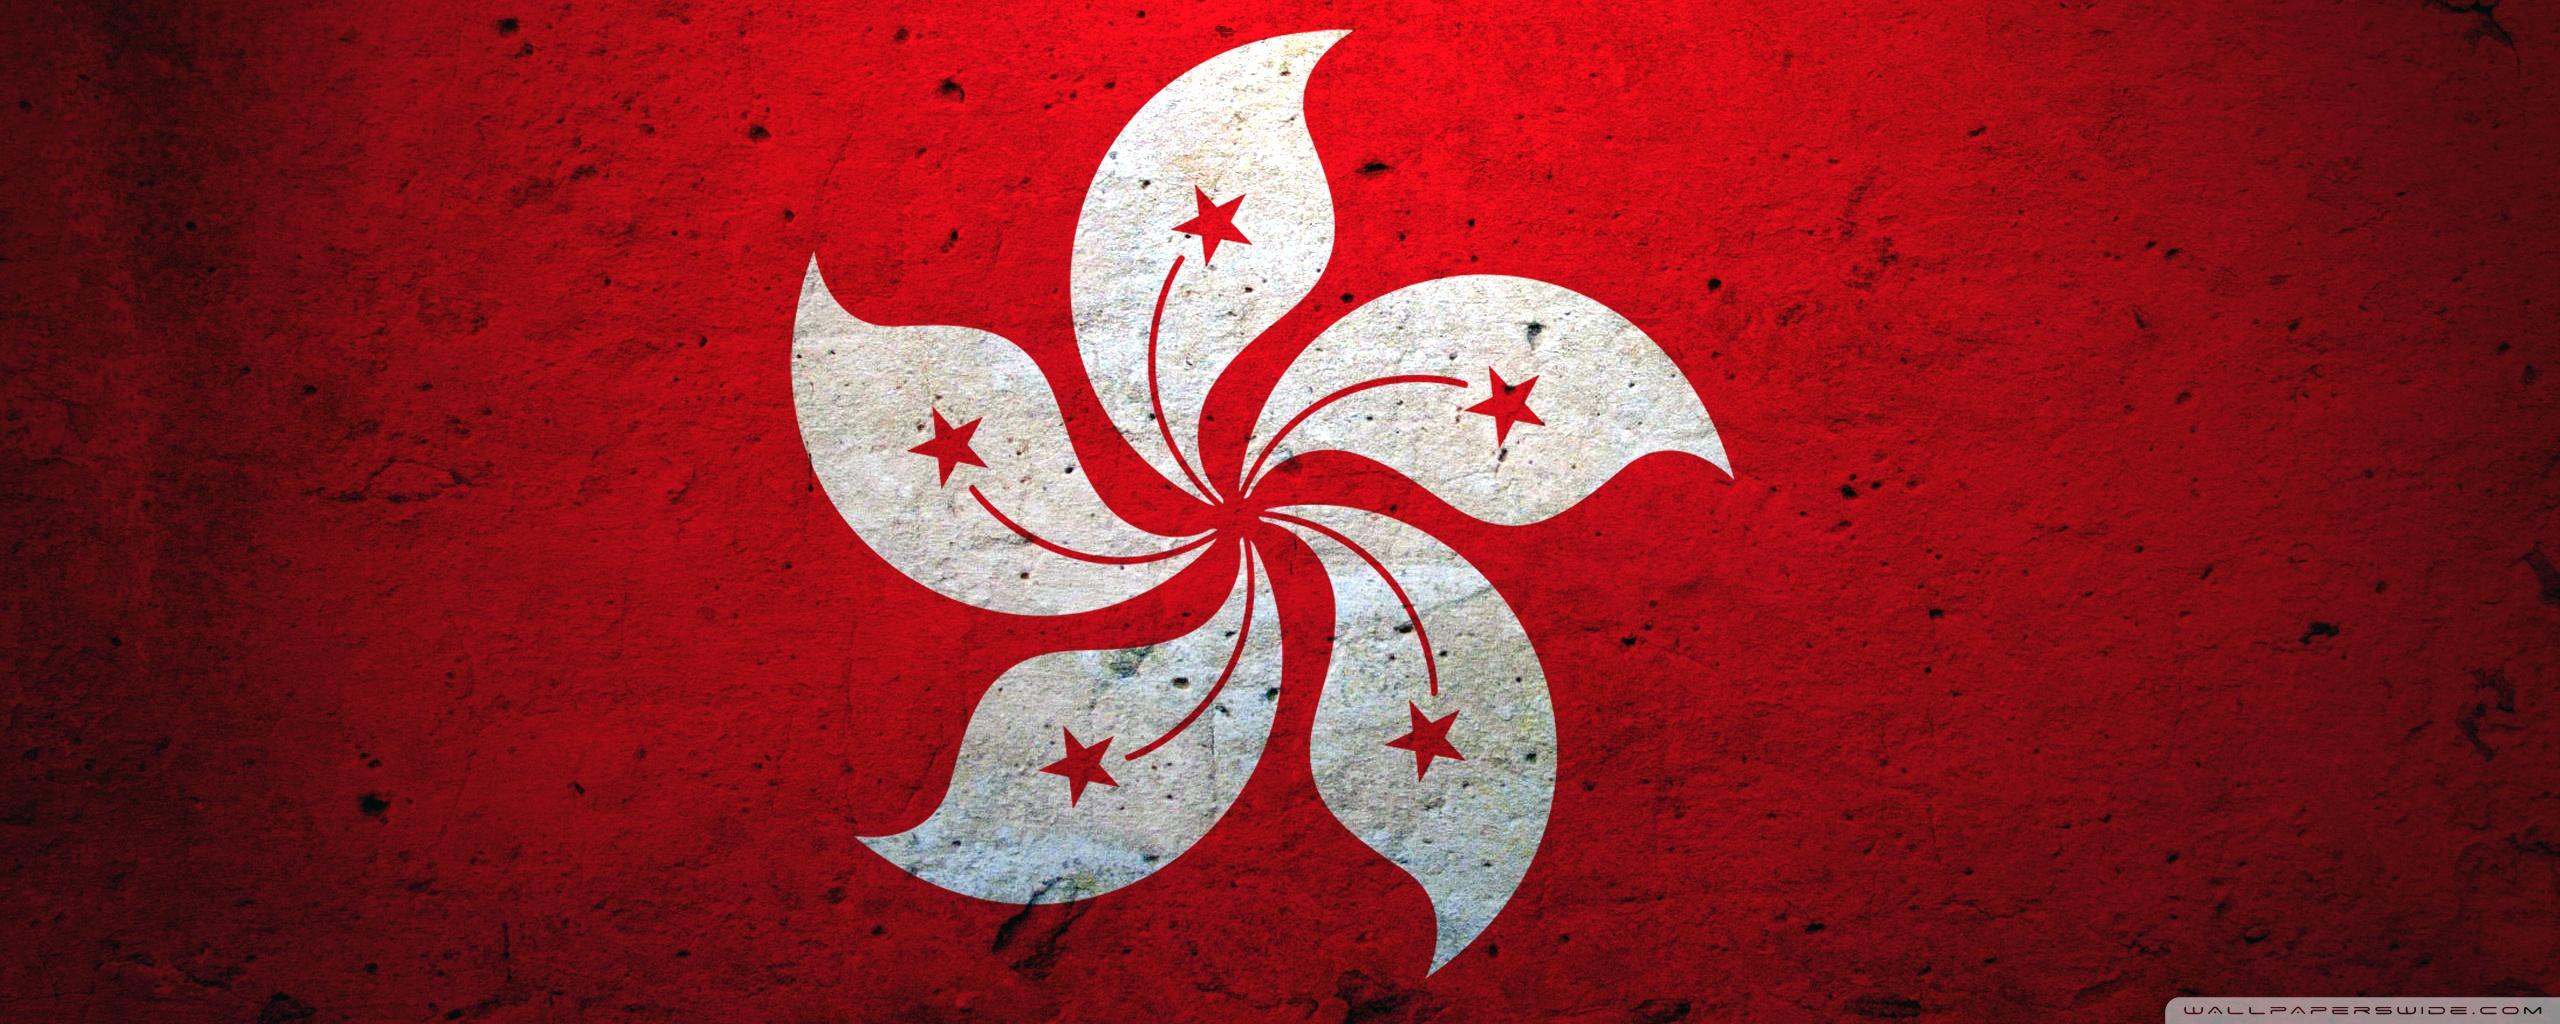 Hong Kong China Flag 4K HD Desktop Wallpaper for 4K Ultra HD TV 2560x1024